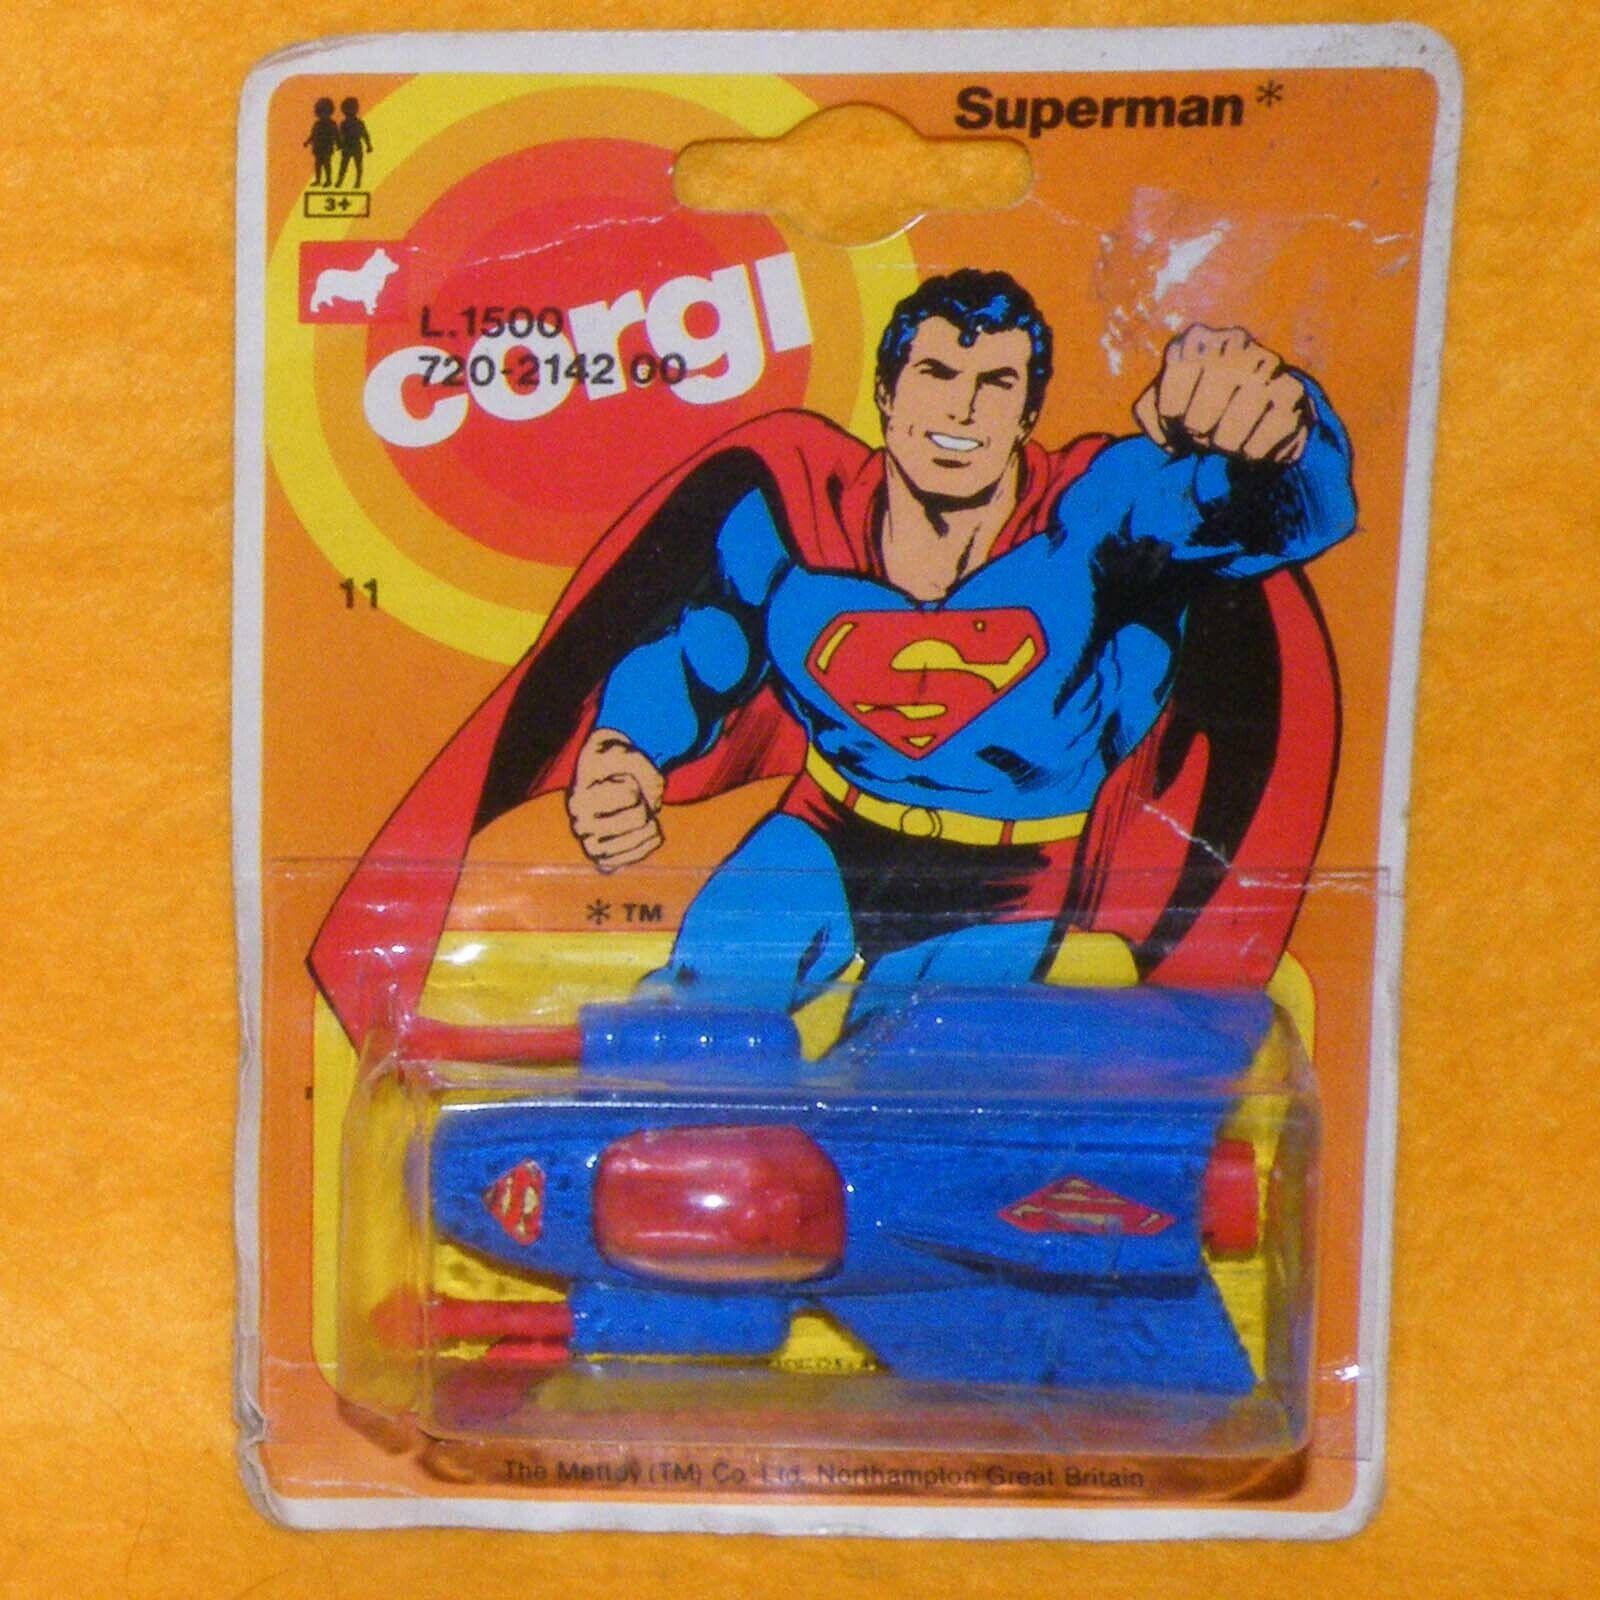 VINTAGE 1978 CORGI JUNIORS 11 SUPERMAN SUPERMOBILE VEHICLE MOC CARDED VARIATION